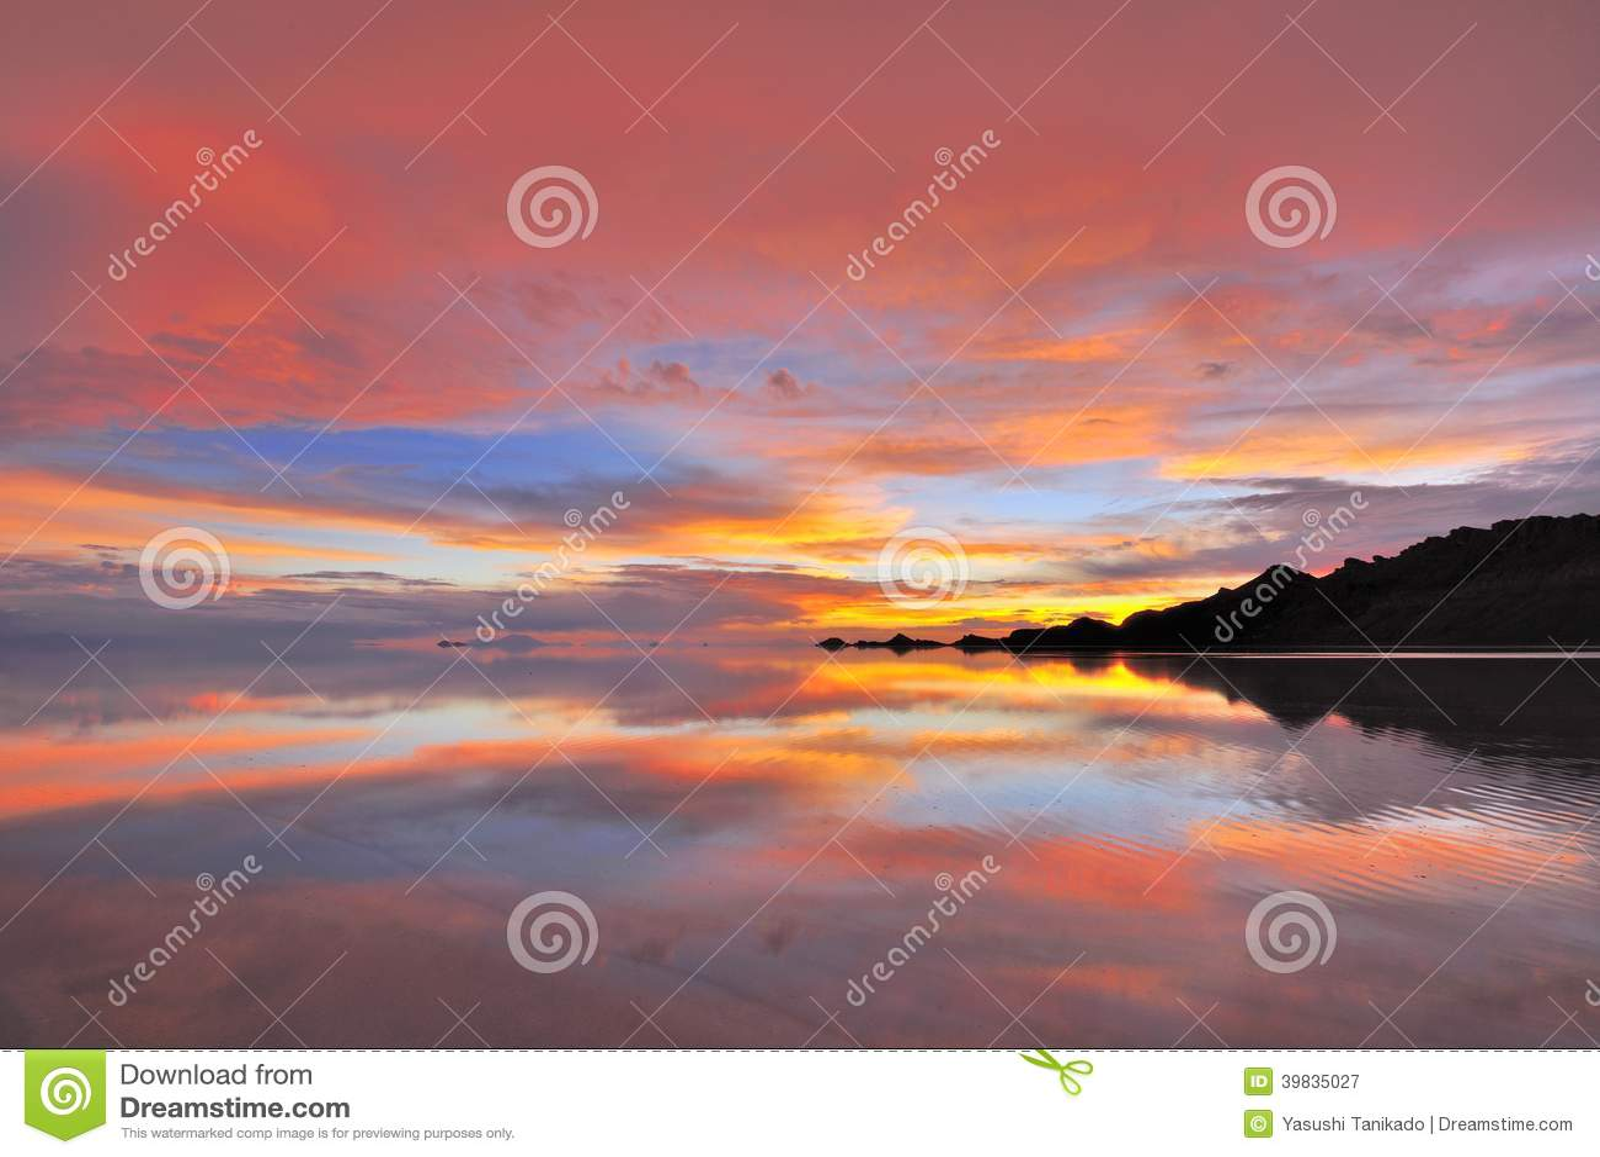 Sun Set Uyuni Salt Flat Stock Image Image Of South Twilight 39835027